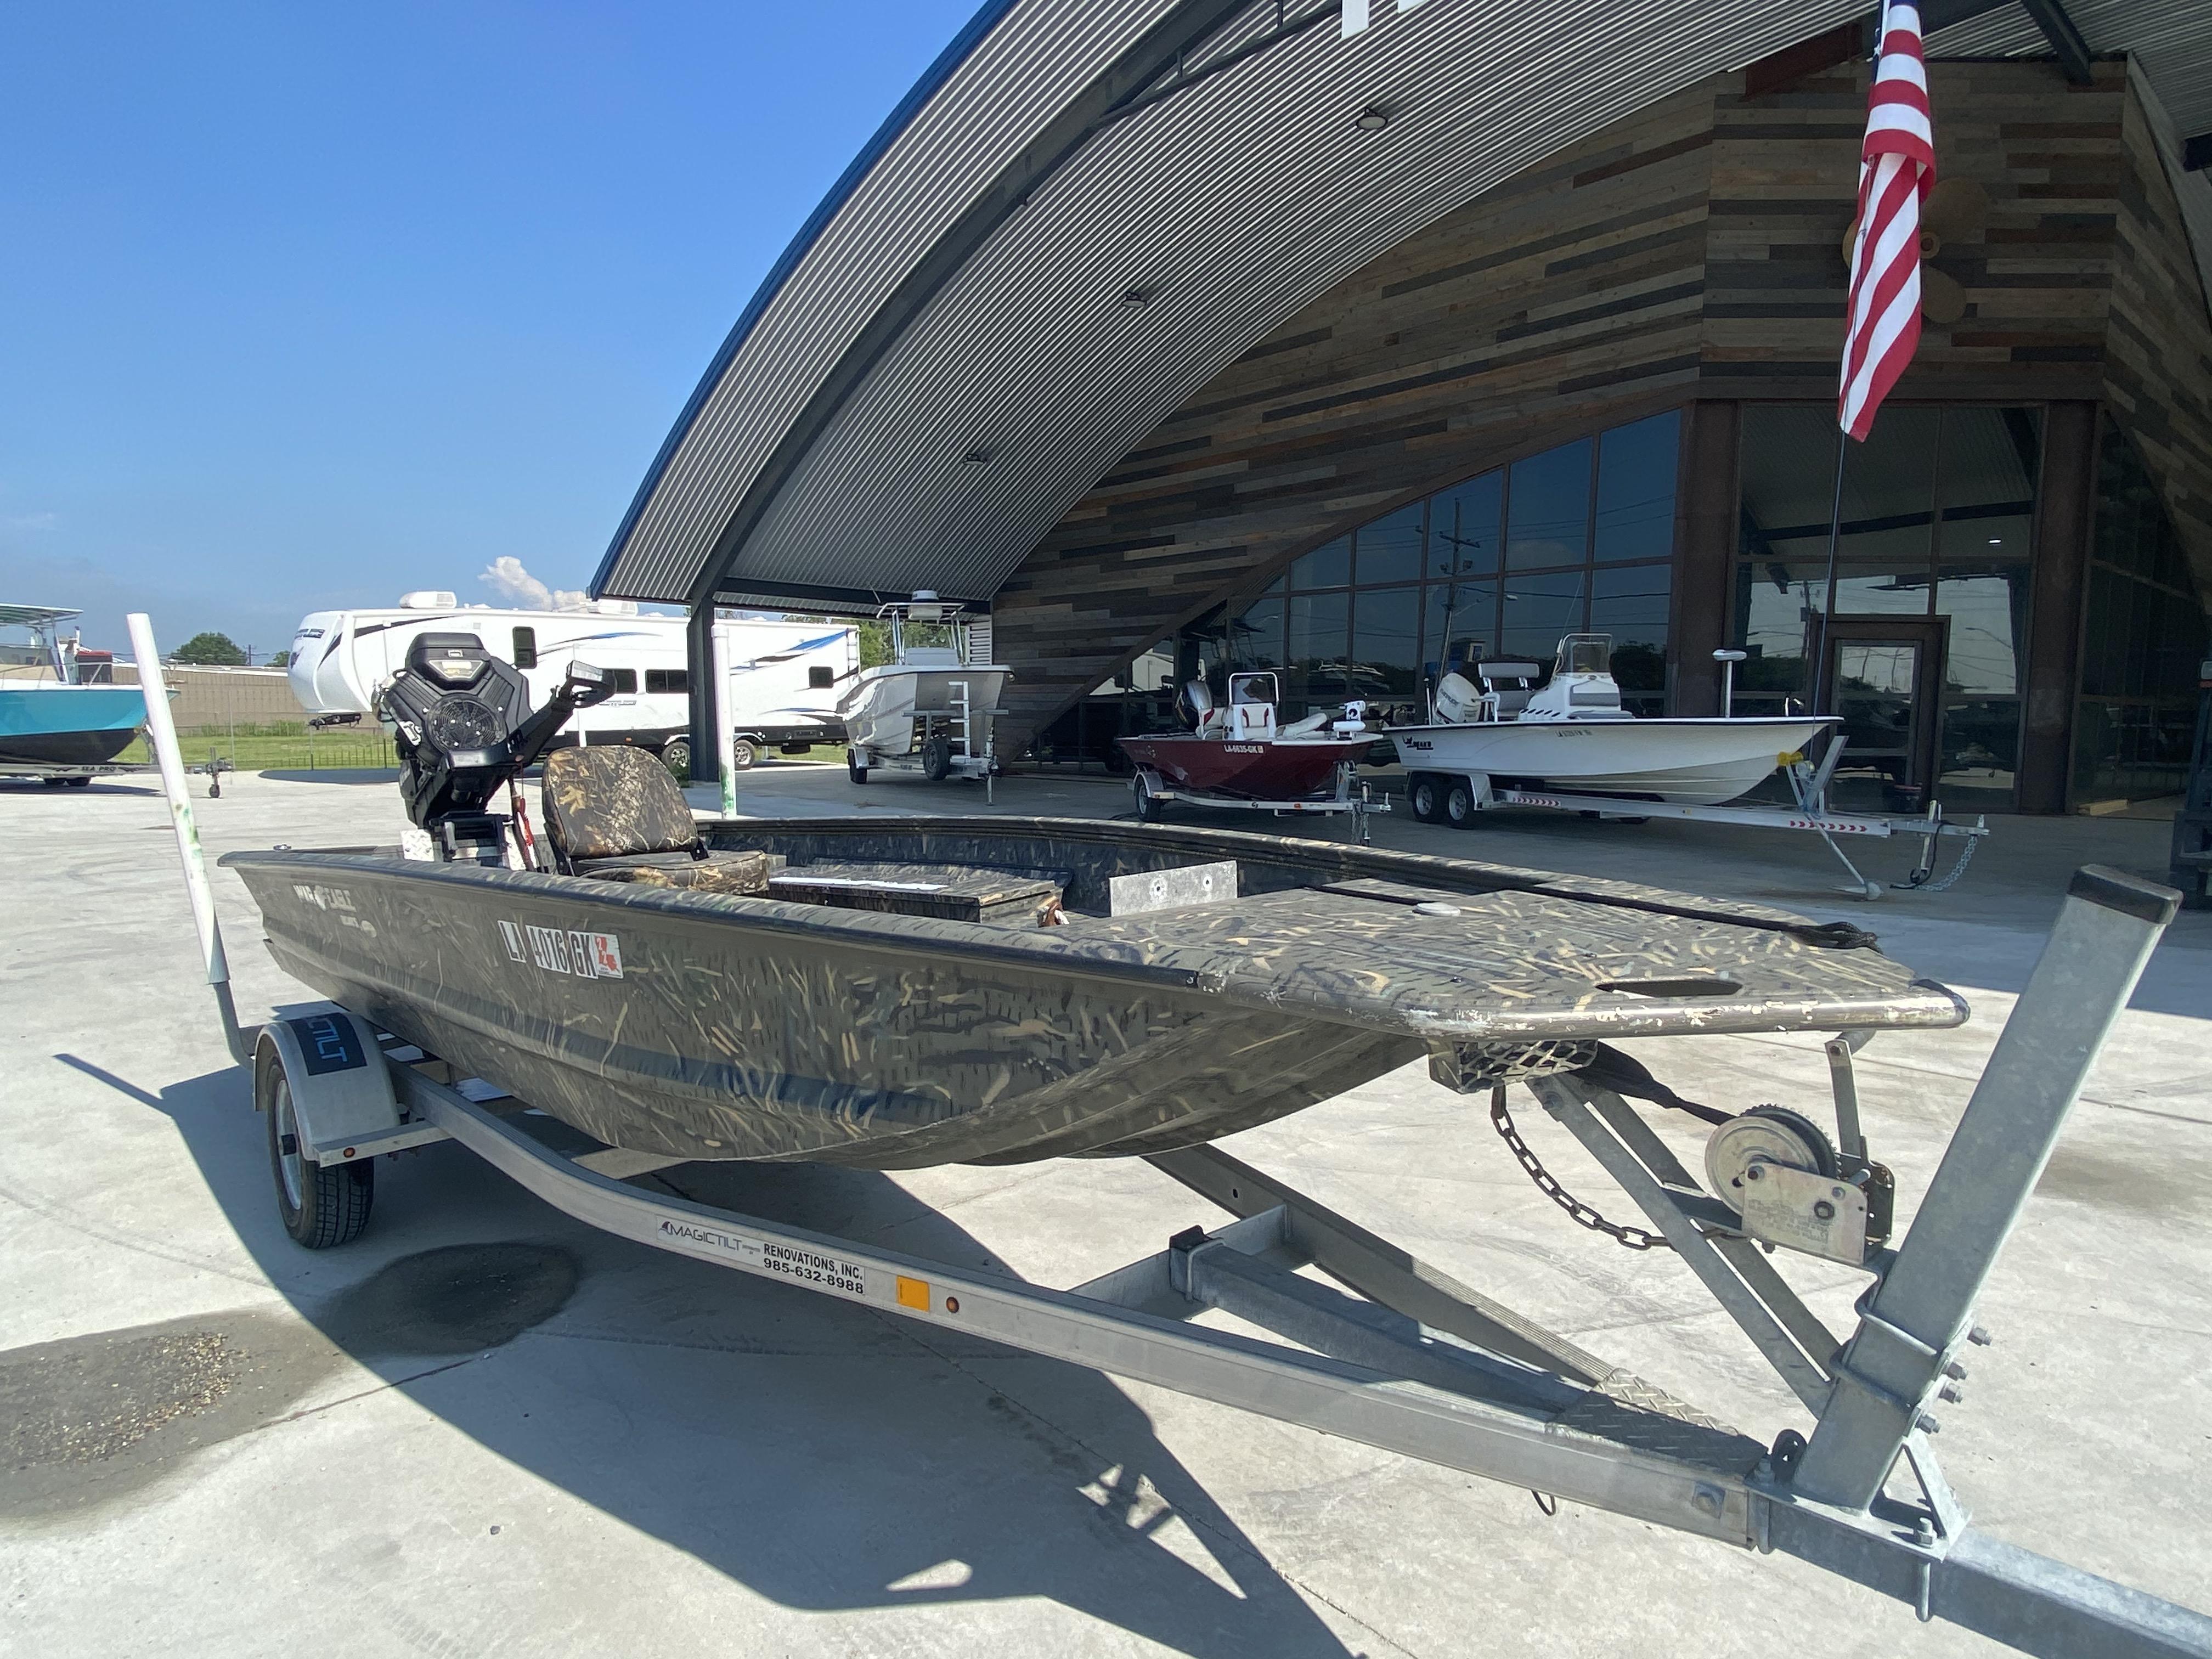 2020 War Eagle boat for sale, model of the boat is Gladiator 750 & Image # 8 of 11